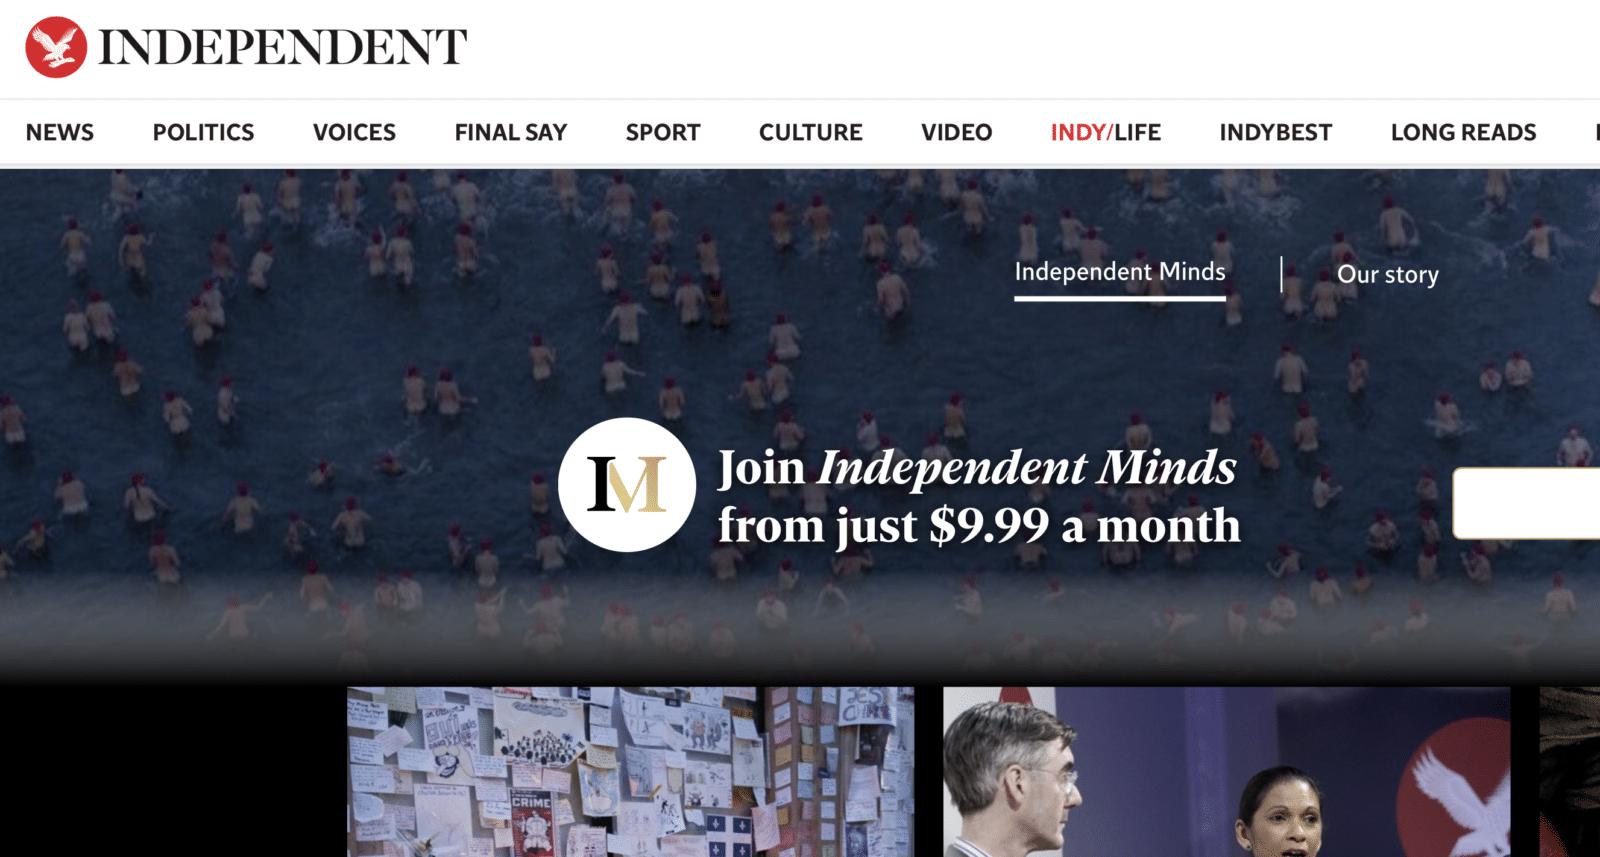 The Independent เริ่มหันมาหารายได้จากโมเดล Subscription แล้ว